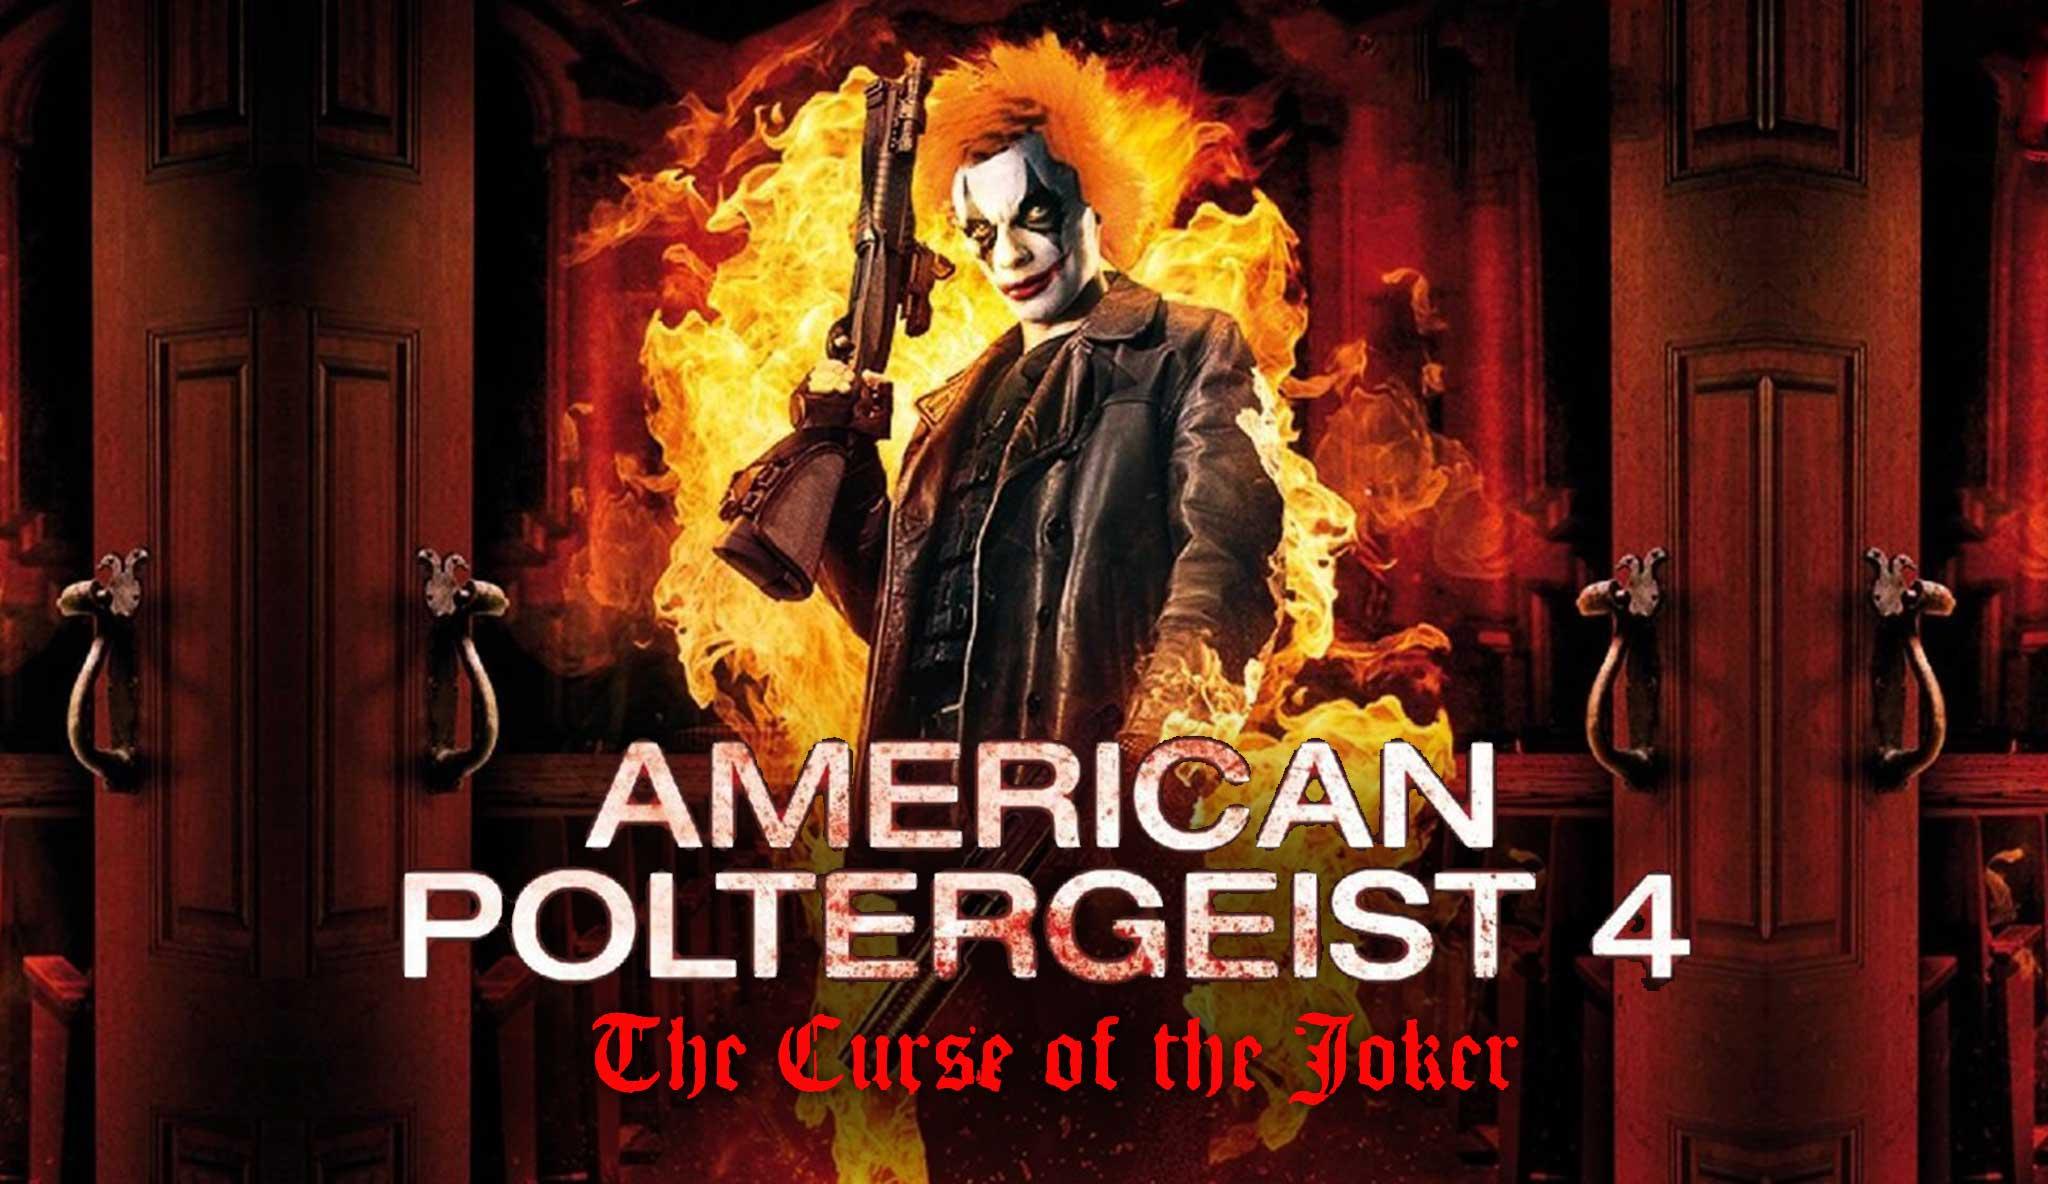 american-poltergeist-4-the-curse-of-the-joker\header.jpg